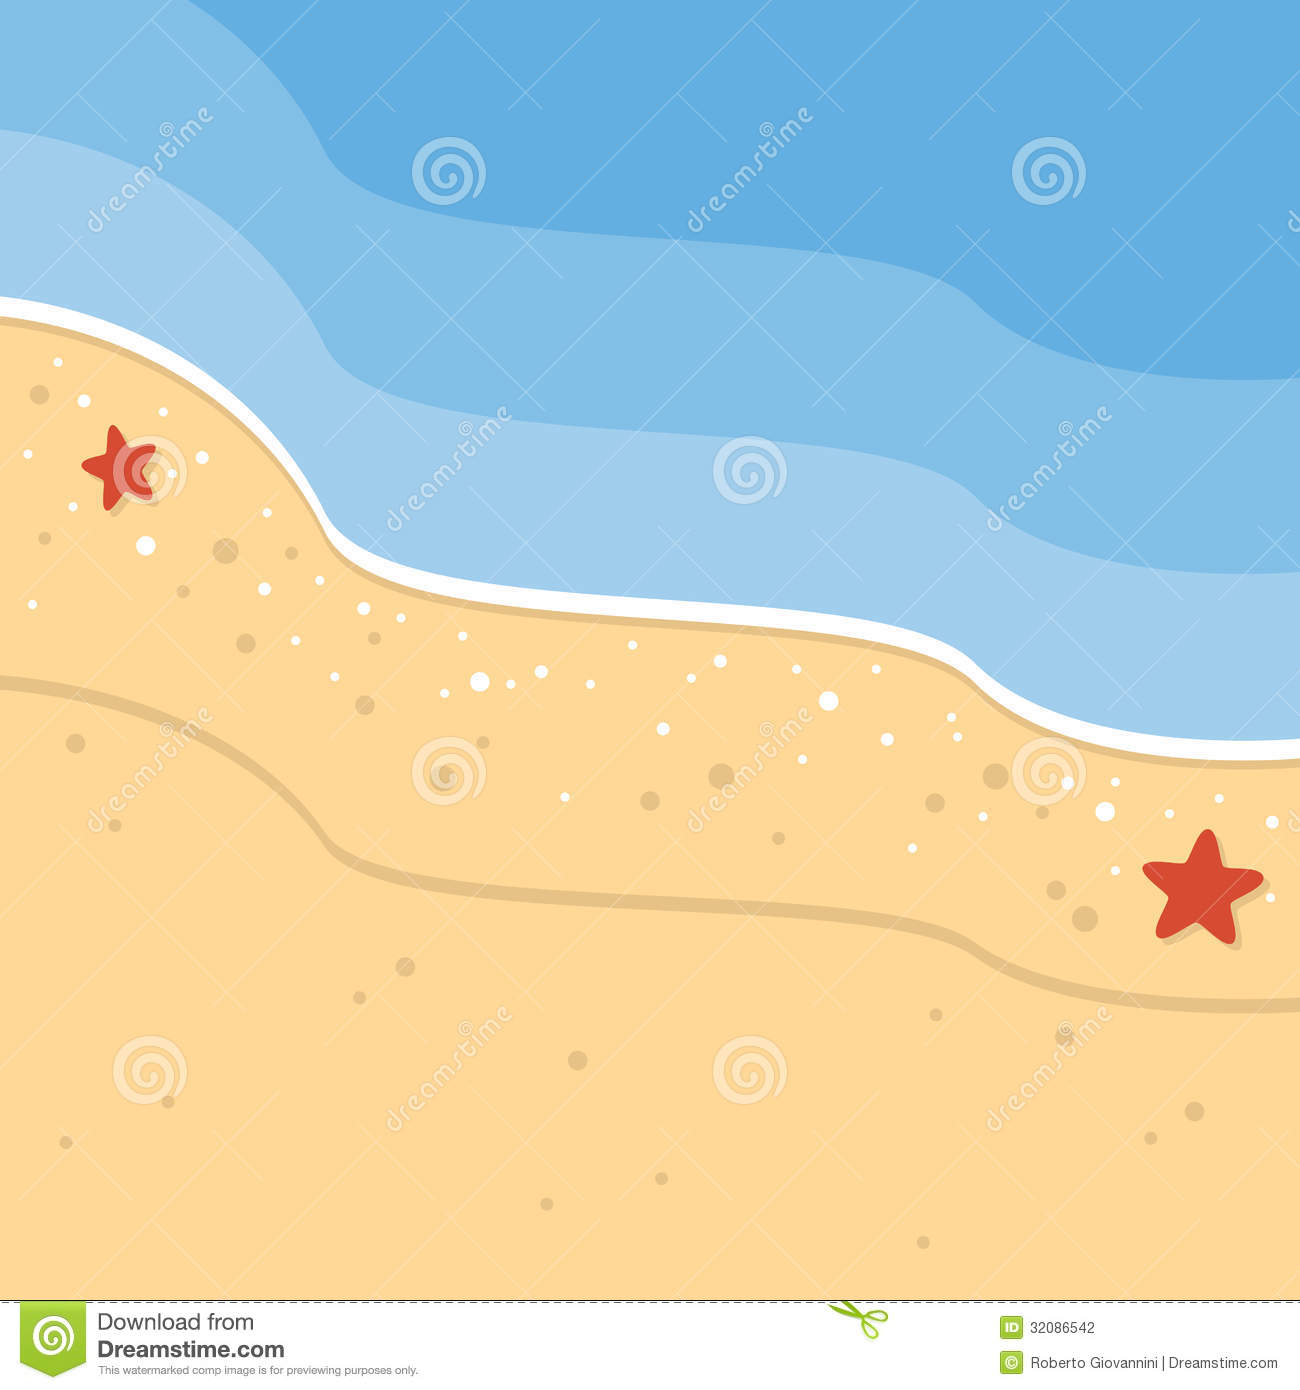 Beach sand clipart.